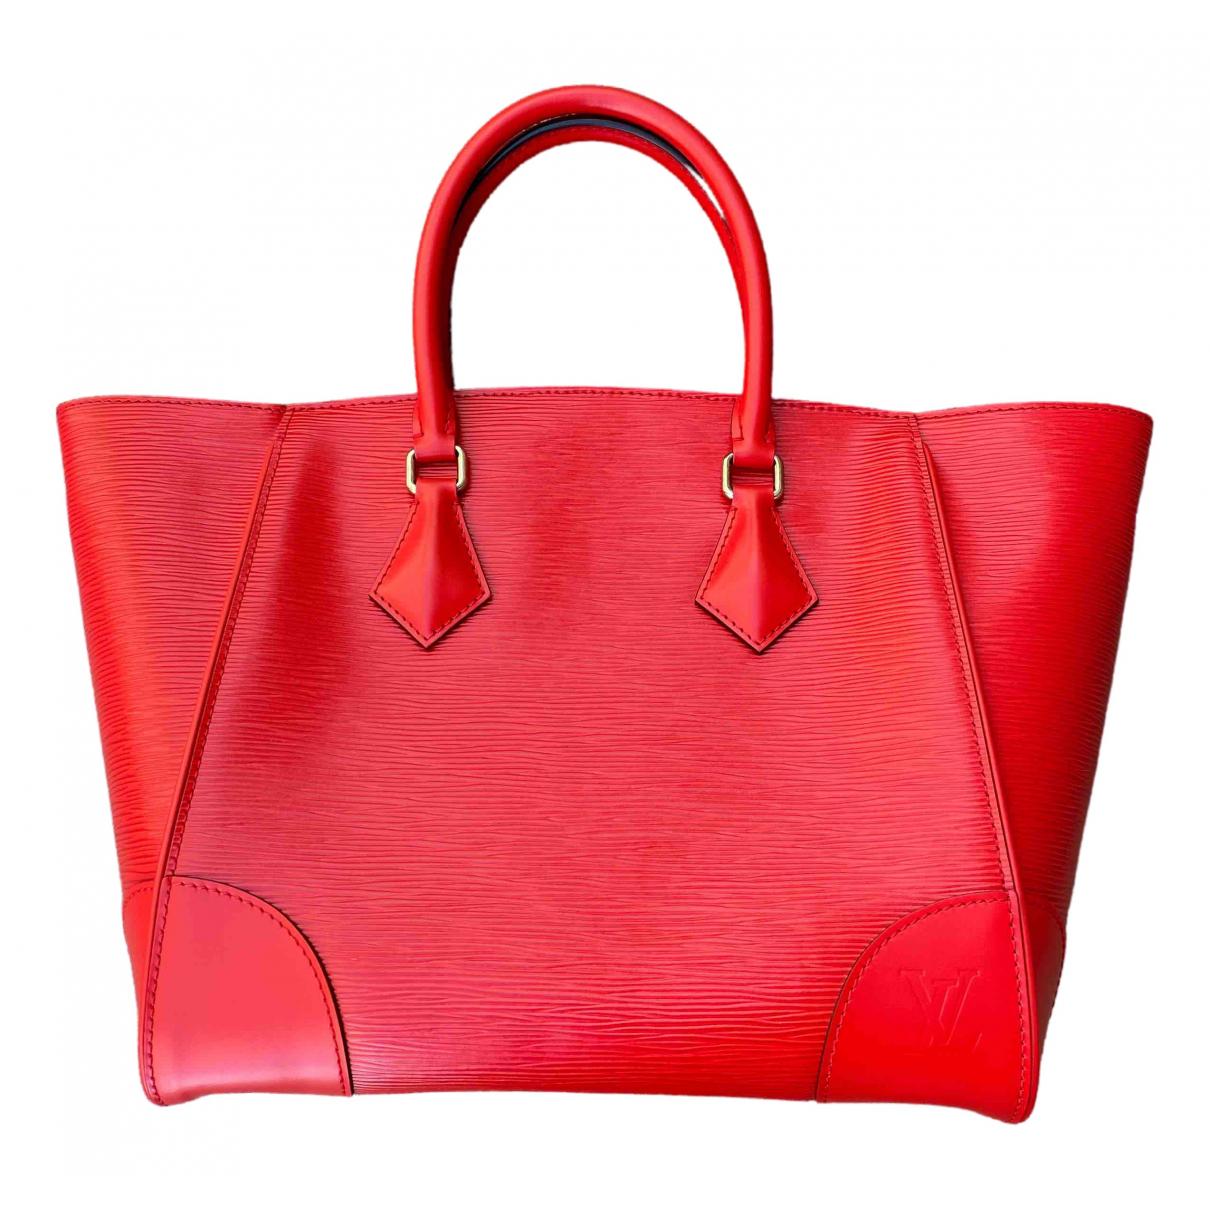 Louis Vuitton Phenix Red Leather handbag for Women \N